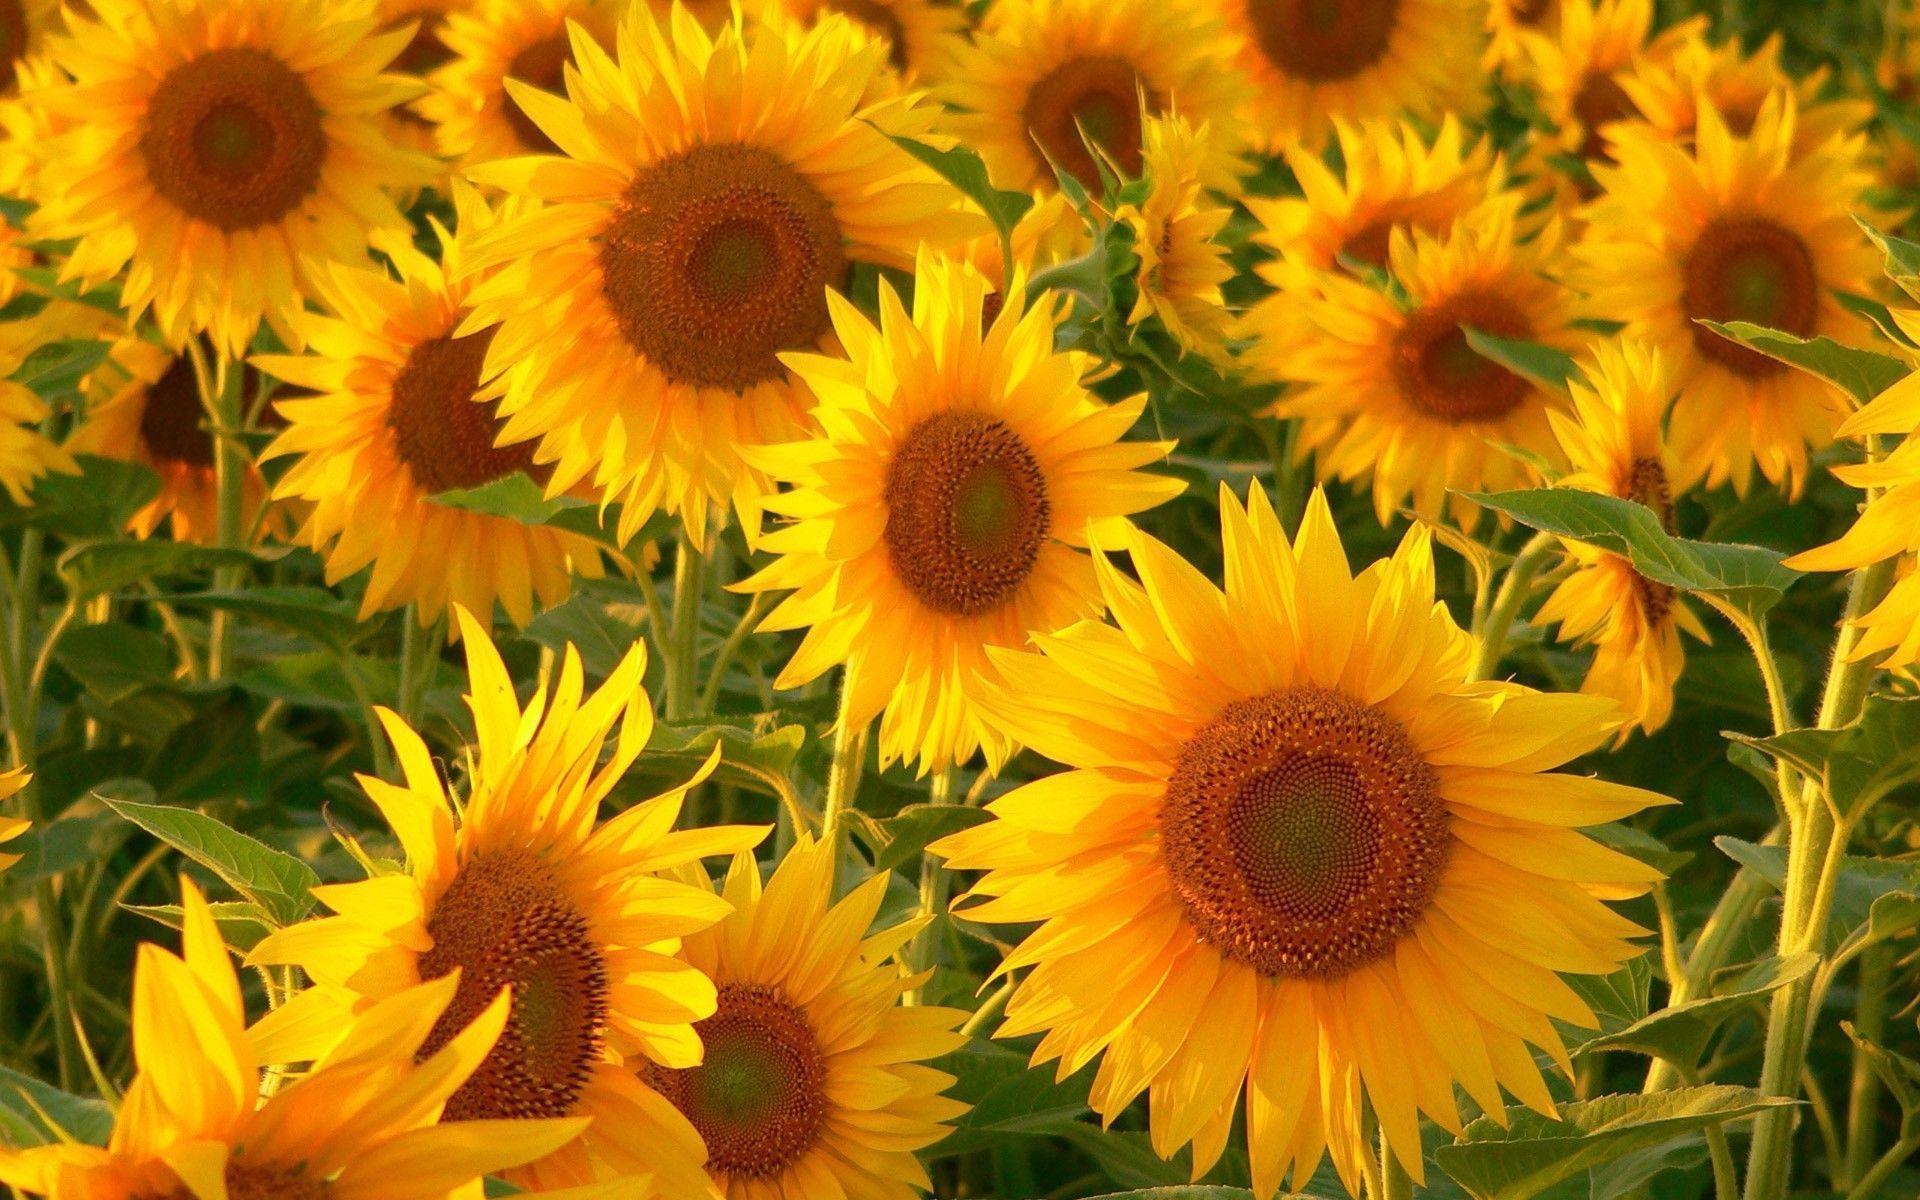 Sunflower Wallpapers - Wallpaper Cave